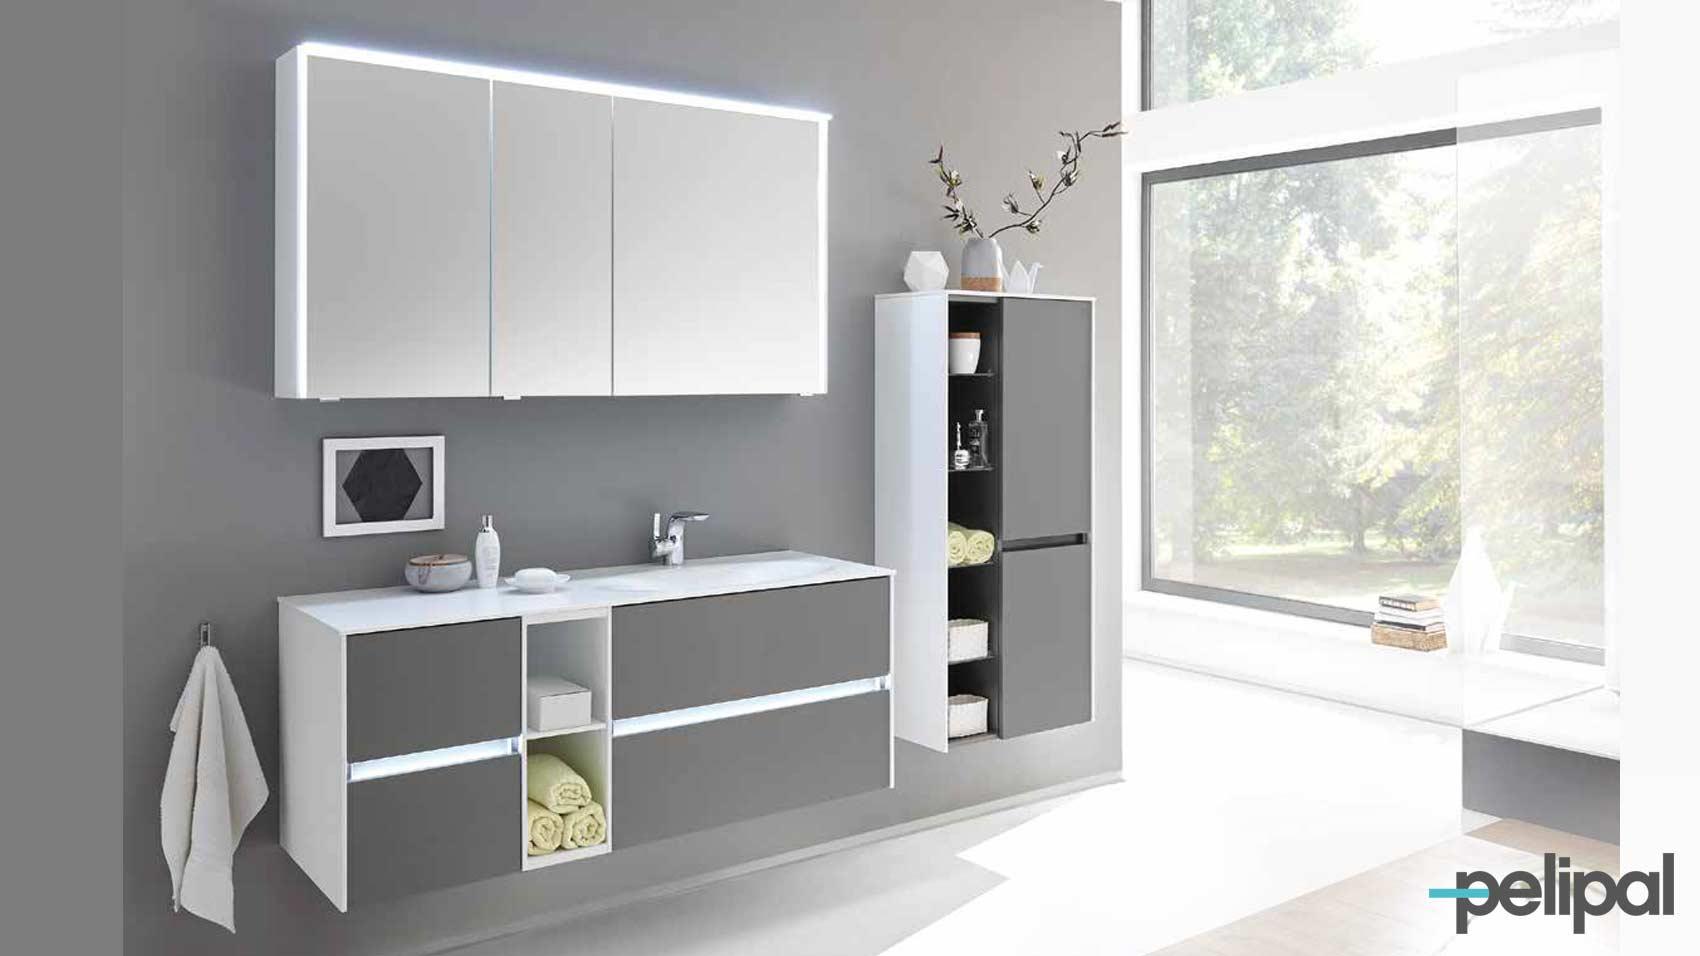 pelipal badm bel nahe erfurt jena weimar m bel u. Black Bedroom Furniture Sets. Home Design Ideas